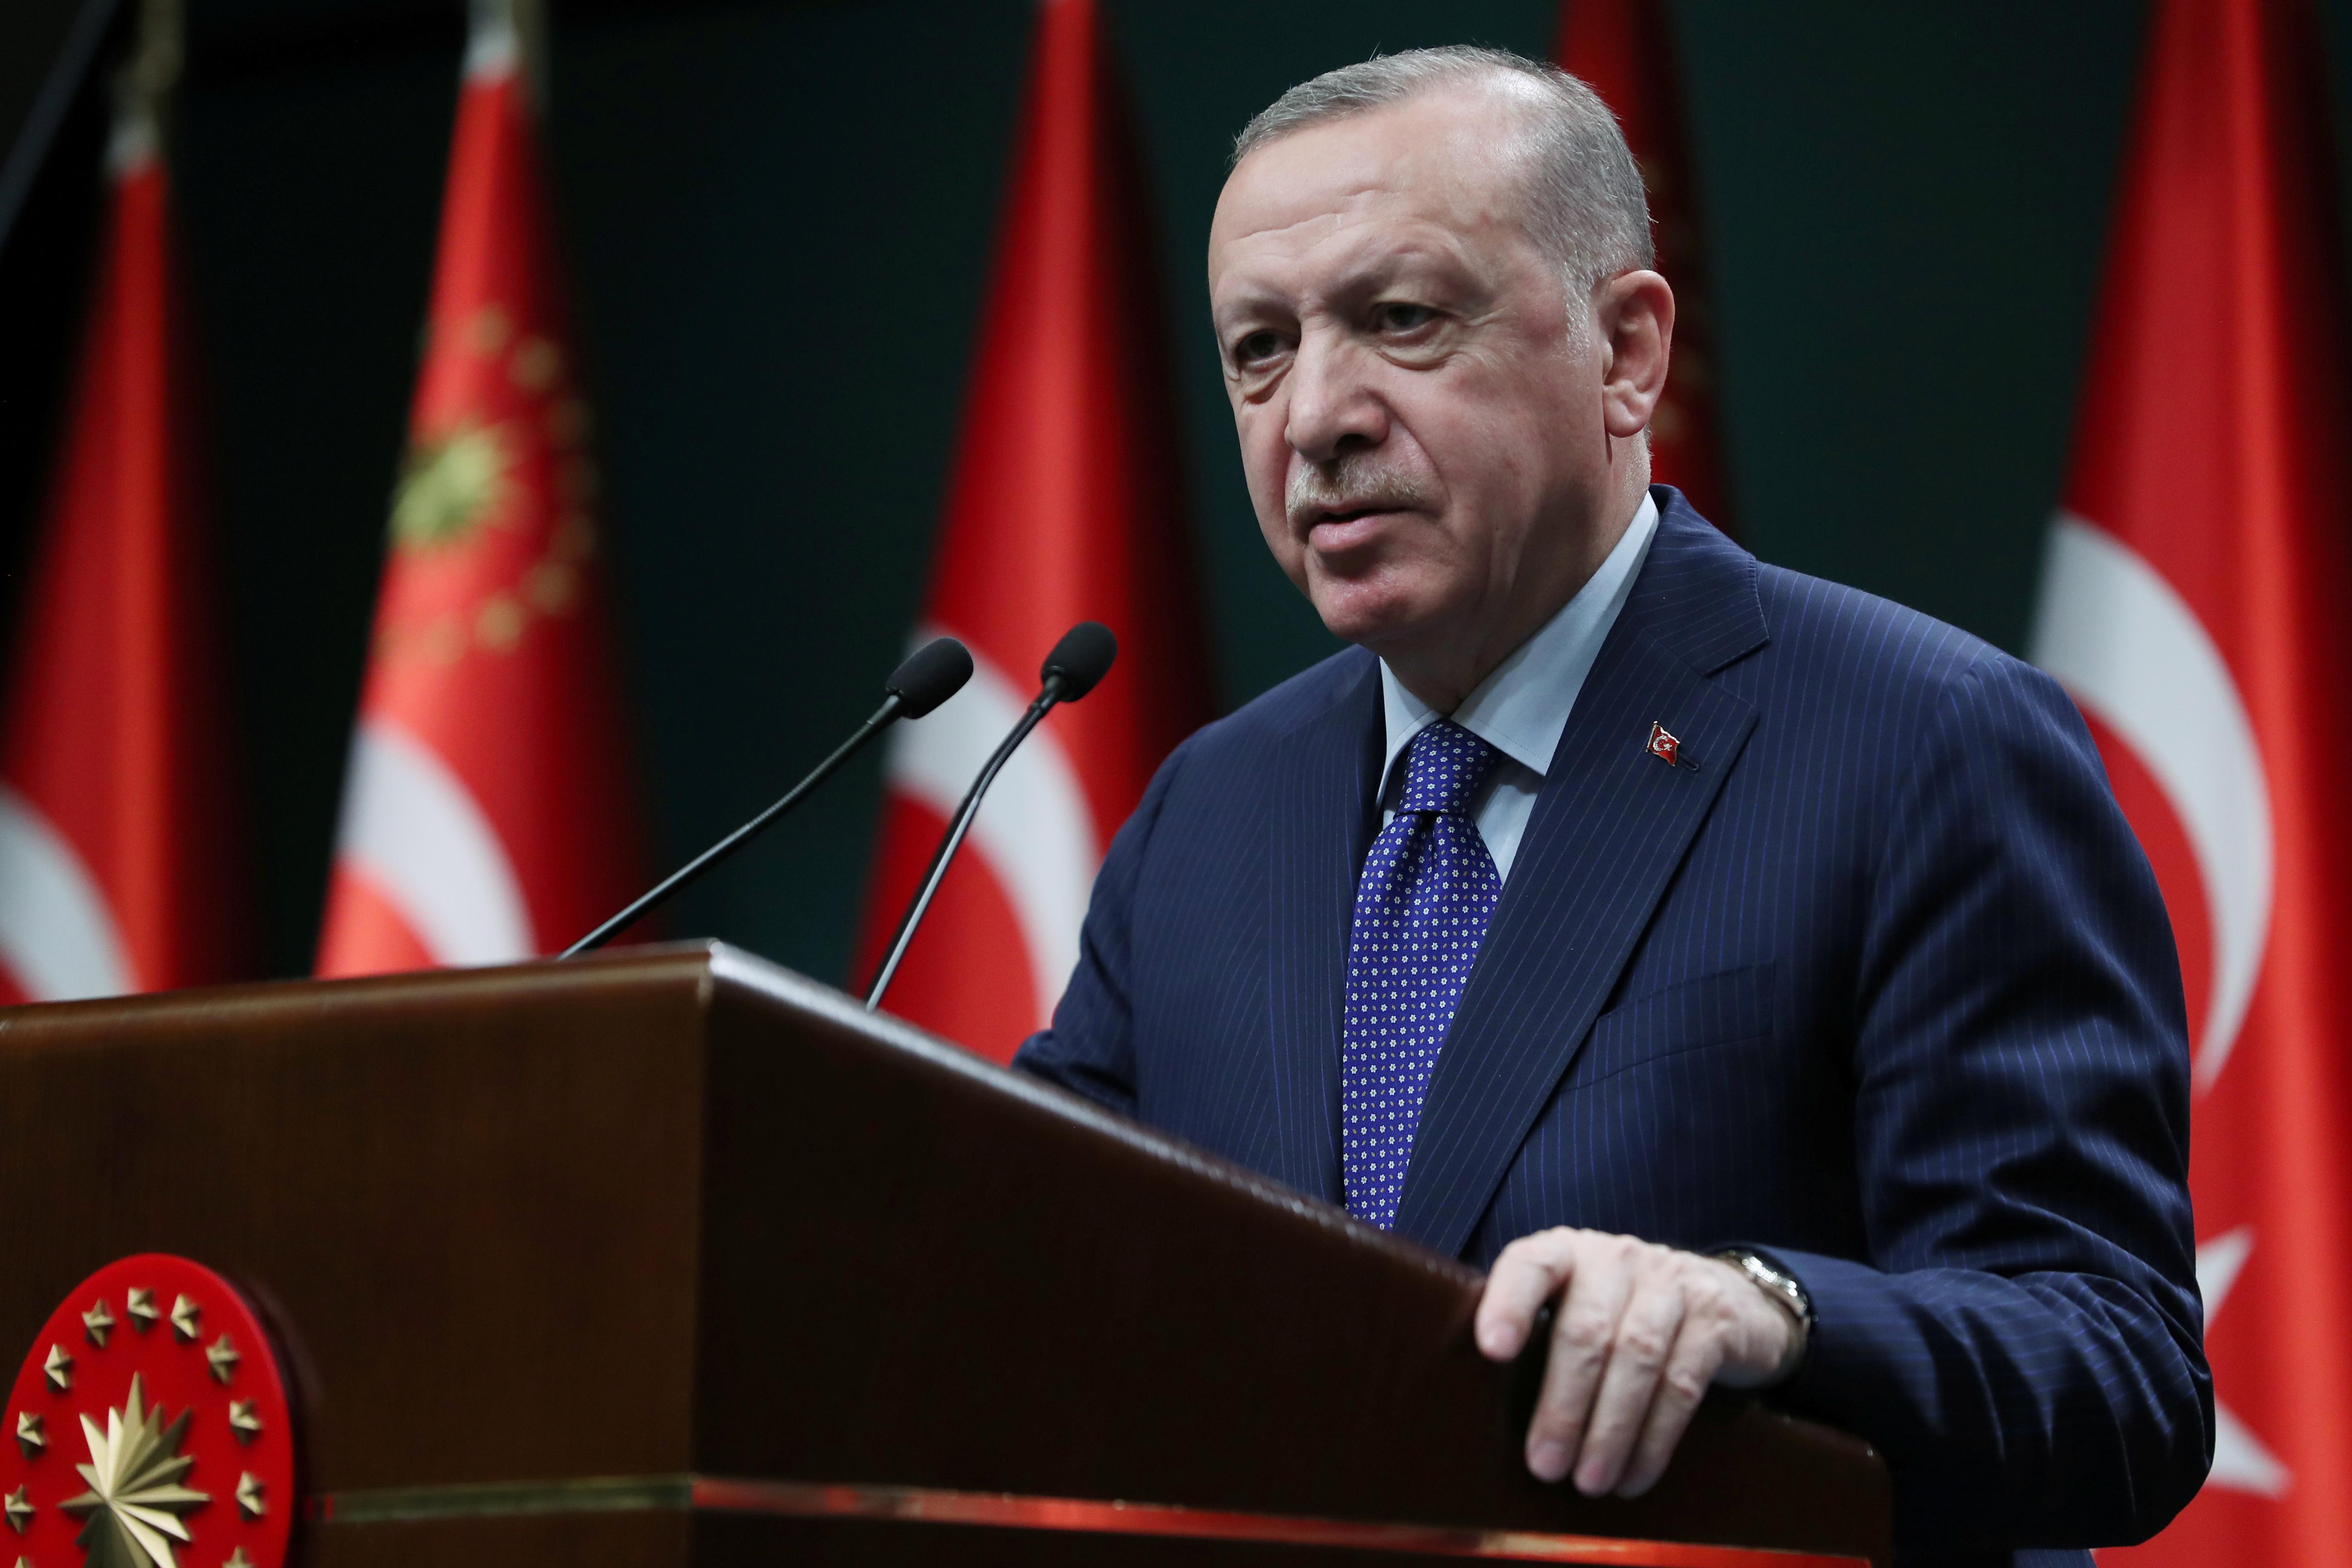 Turkish President Tayyip Erdogan gives a statement after a meeting in Ankara, Turkey, April 5, 2021. Murat Cetinmuhurdar/PPO/Handout via REUTERS